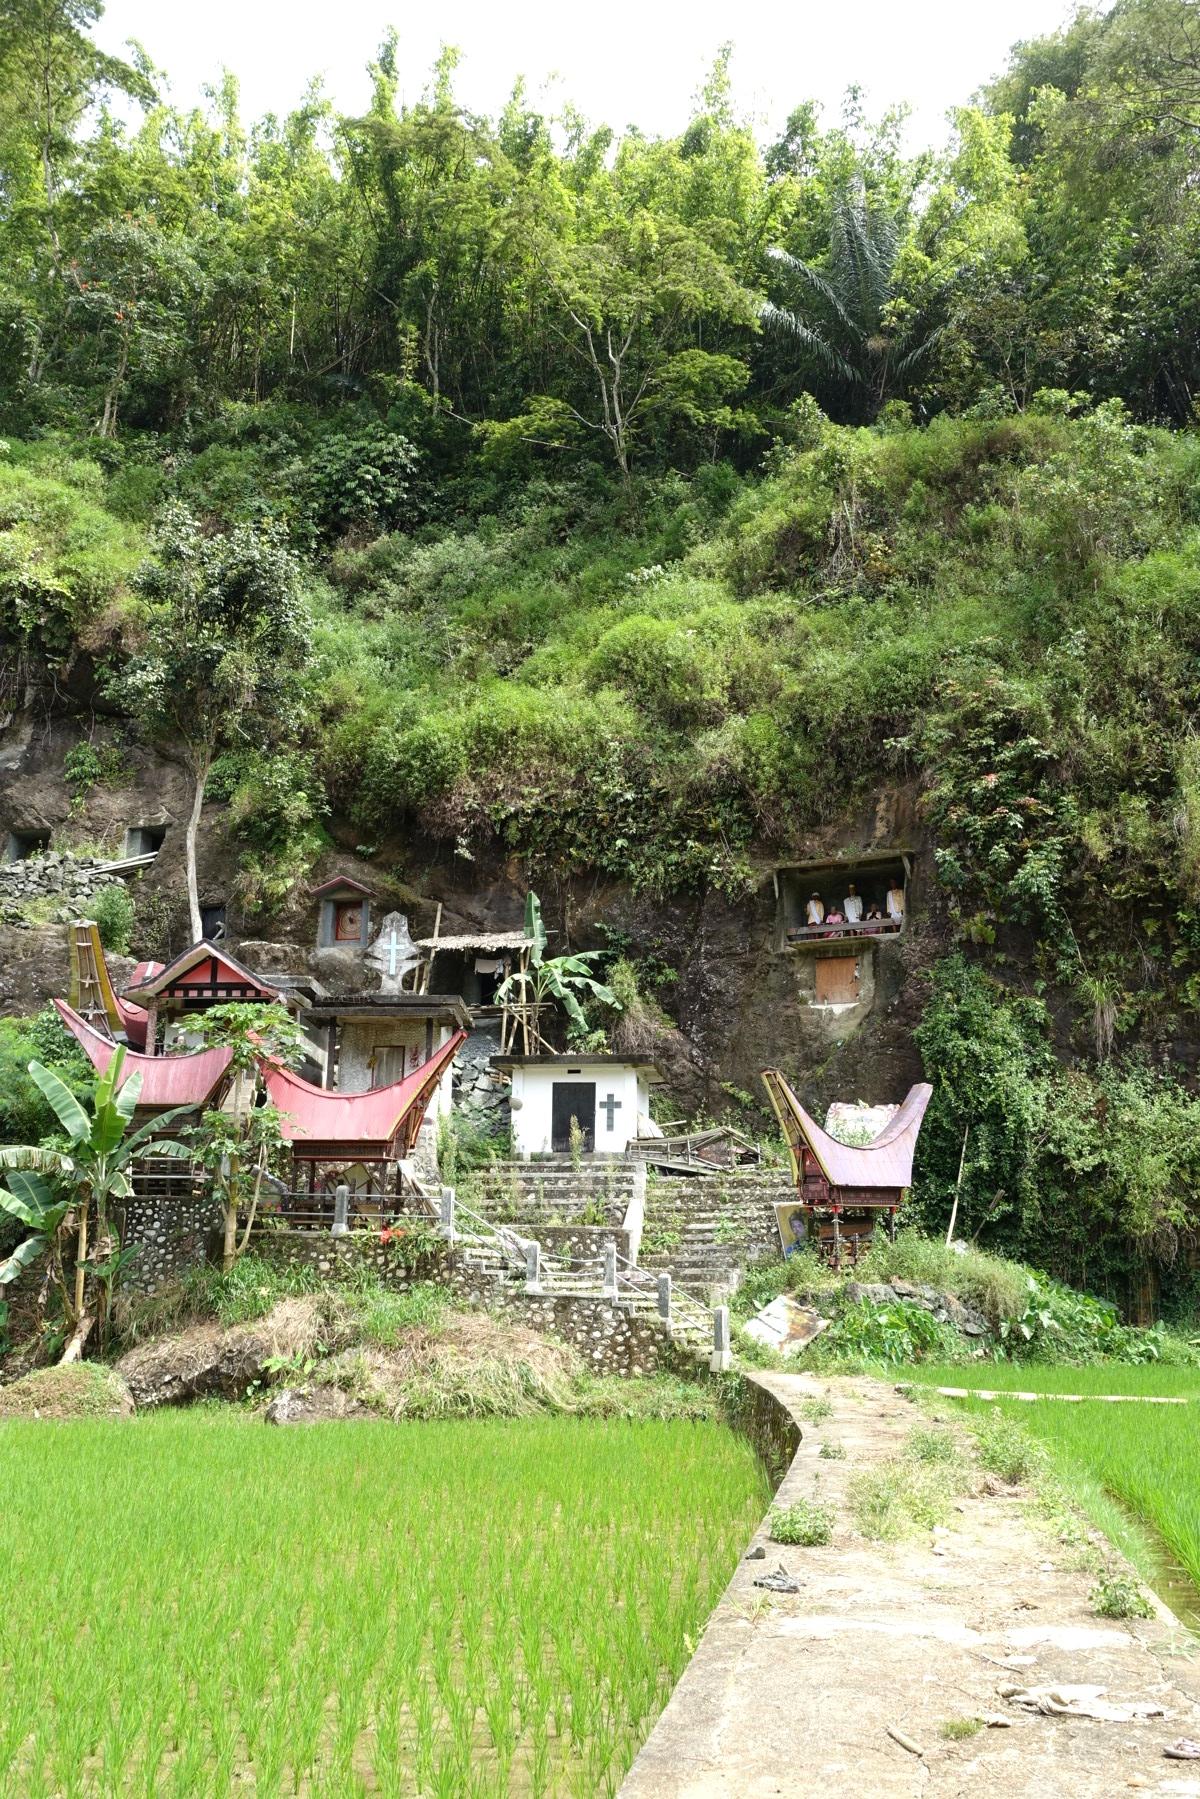 Indonesie_Sulawesi_Toraja_Rantepao DSC05096